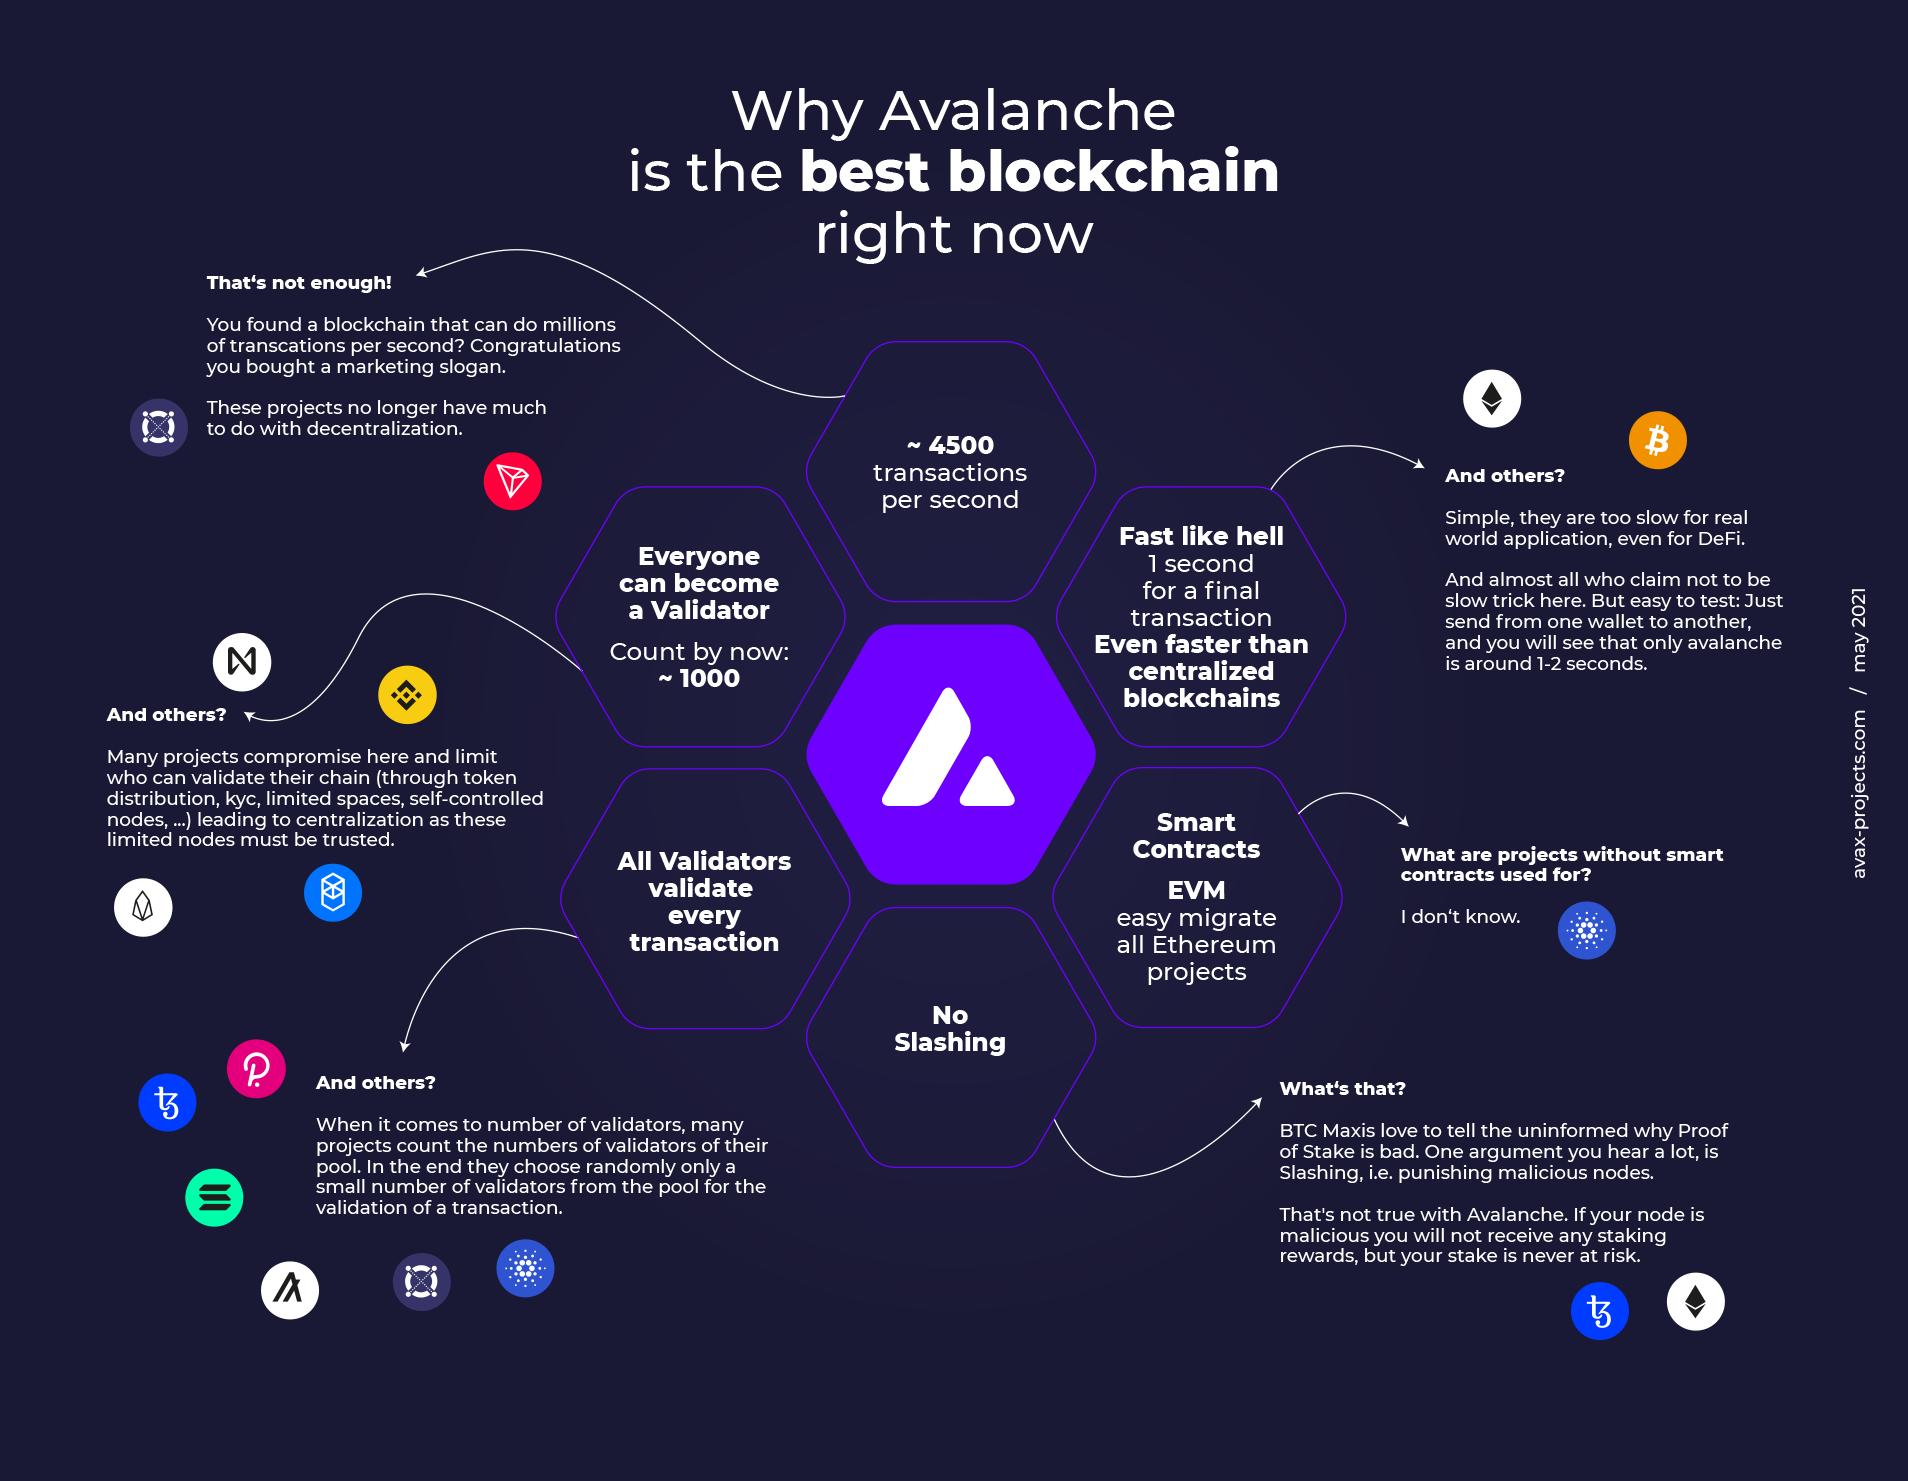 avalanche the best blockchain